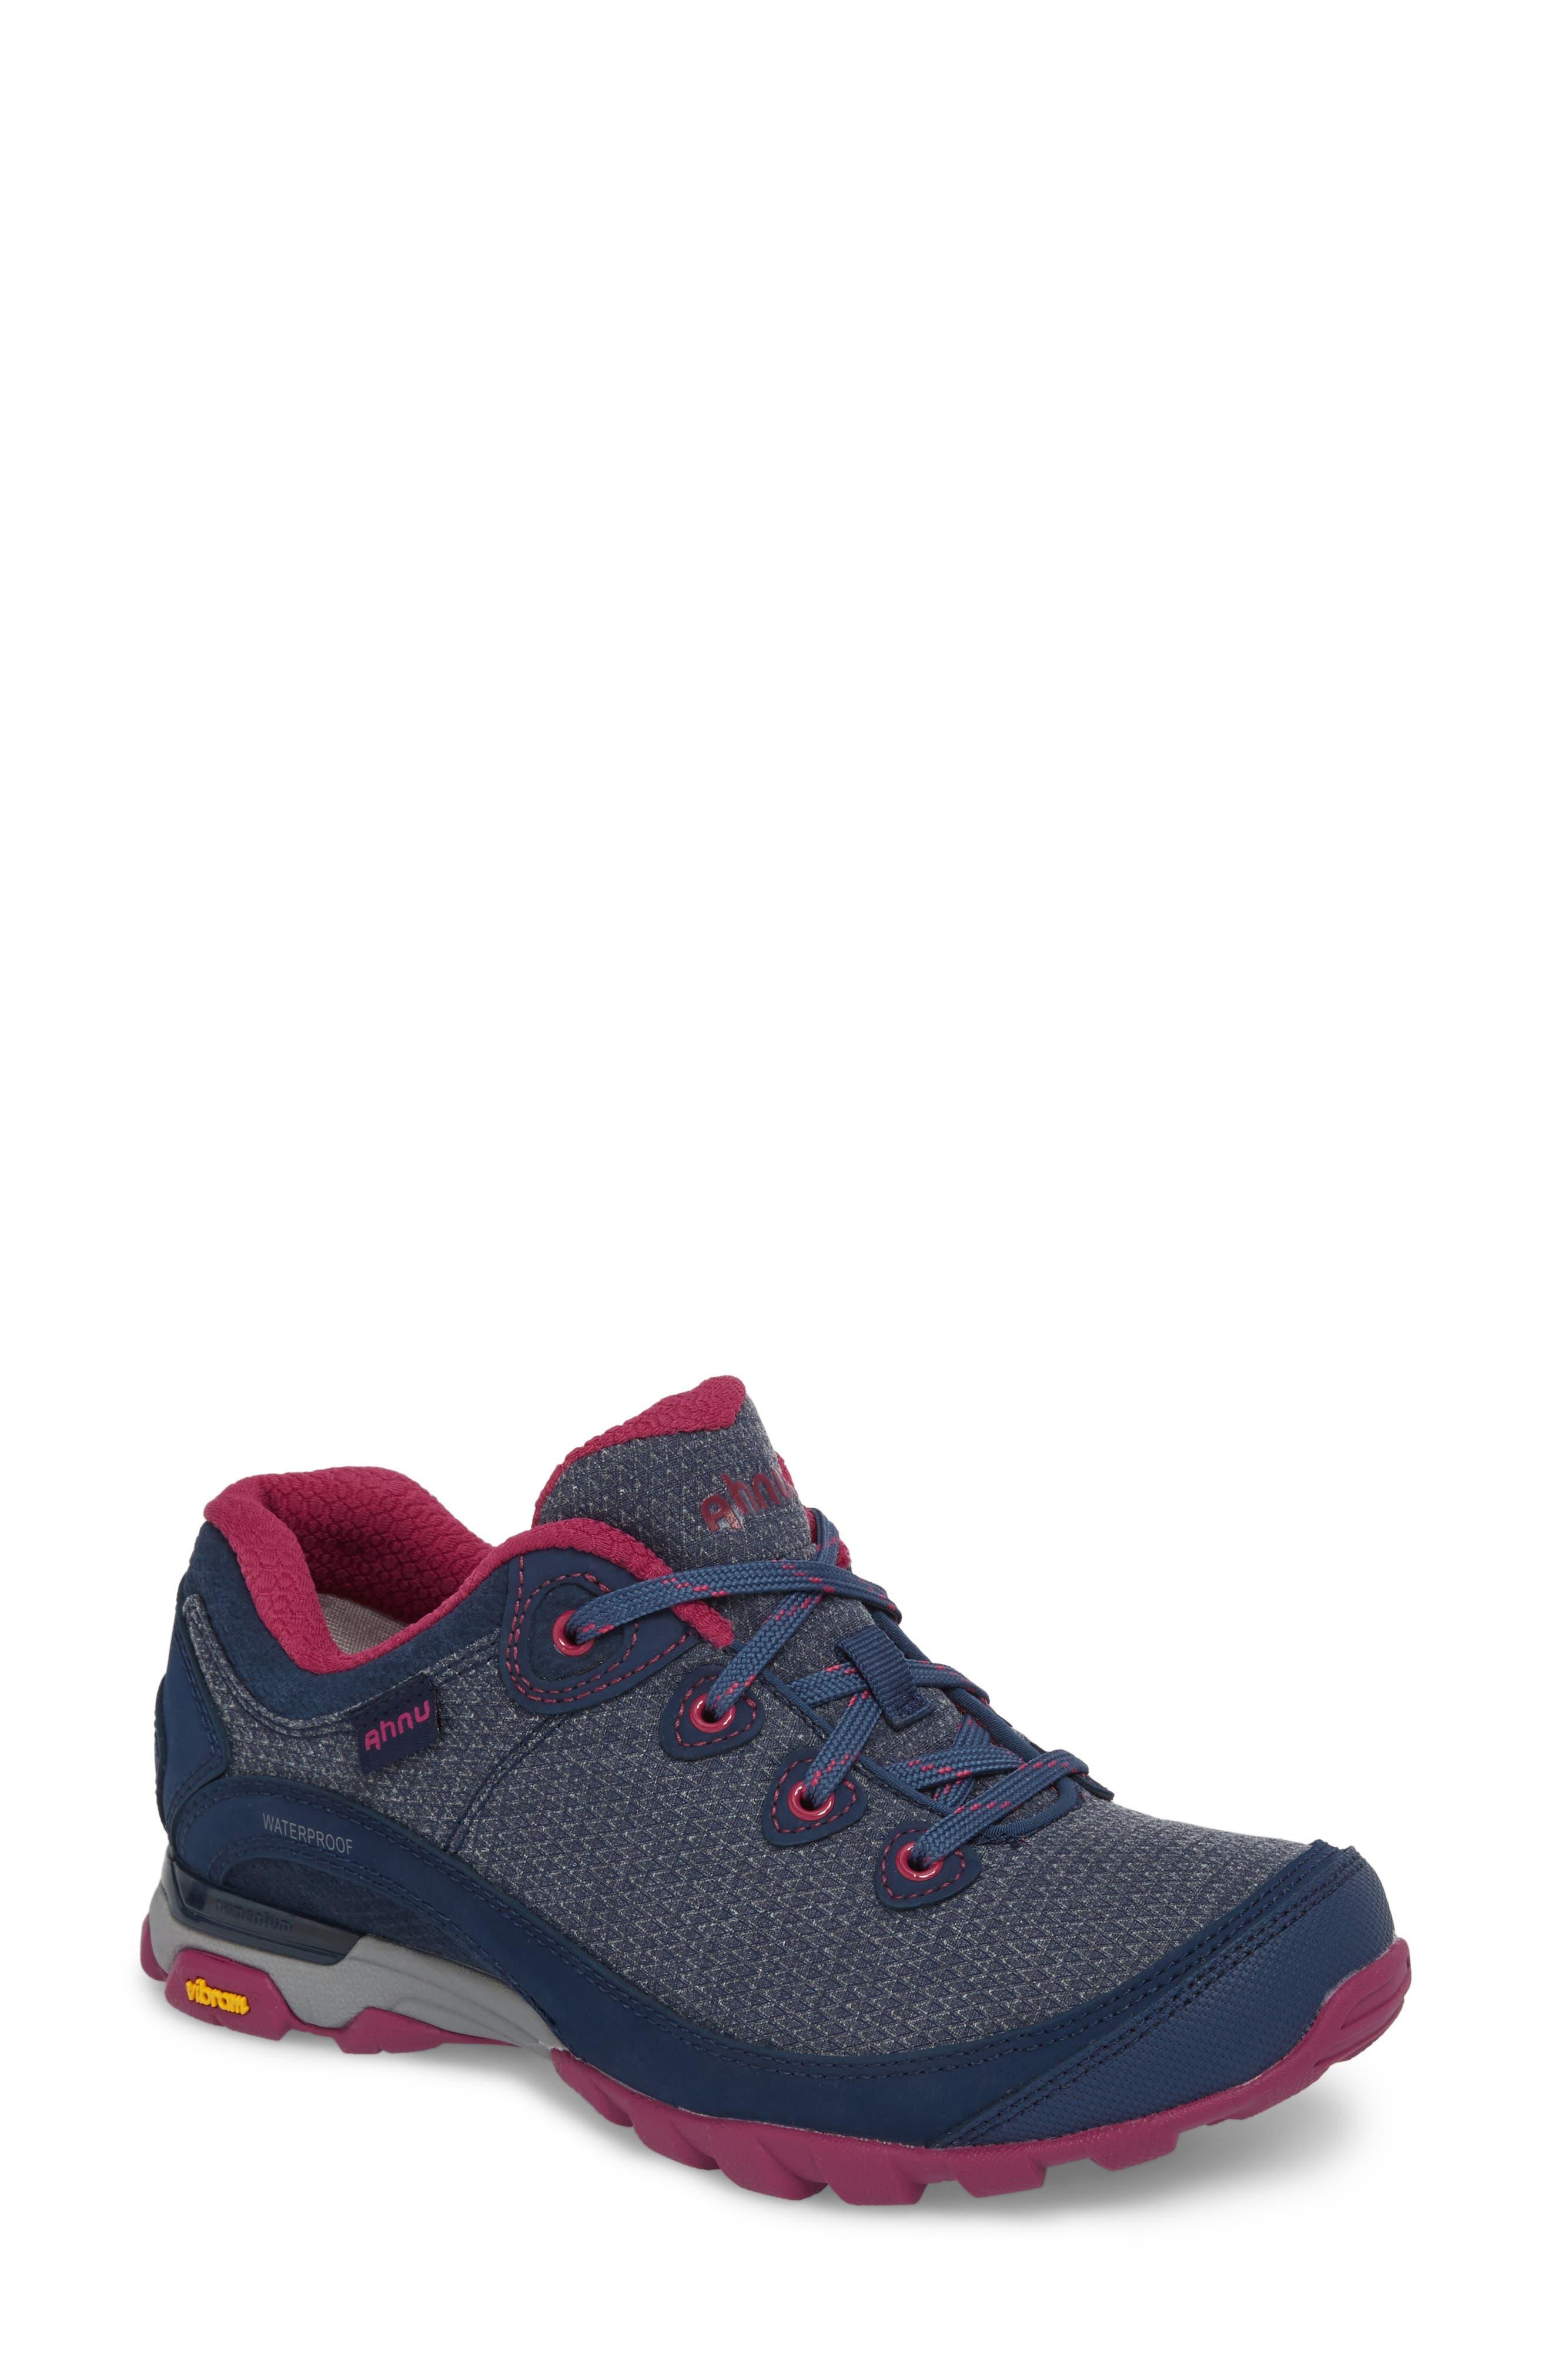 Ahnu by Teva Sugarpine II Waterproof Hiking Sneaker,                             Main thumbnail 1, color,                             INSIGNIA BLUE